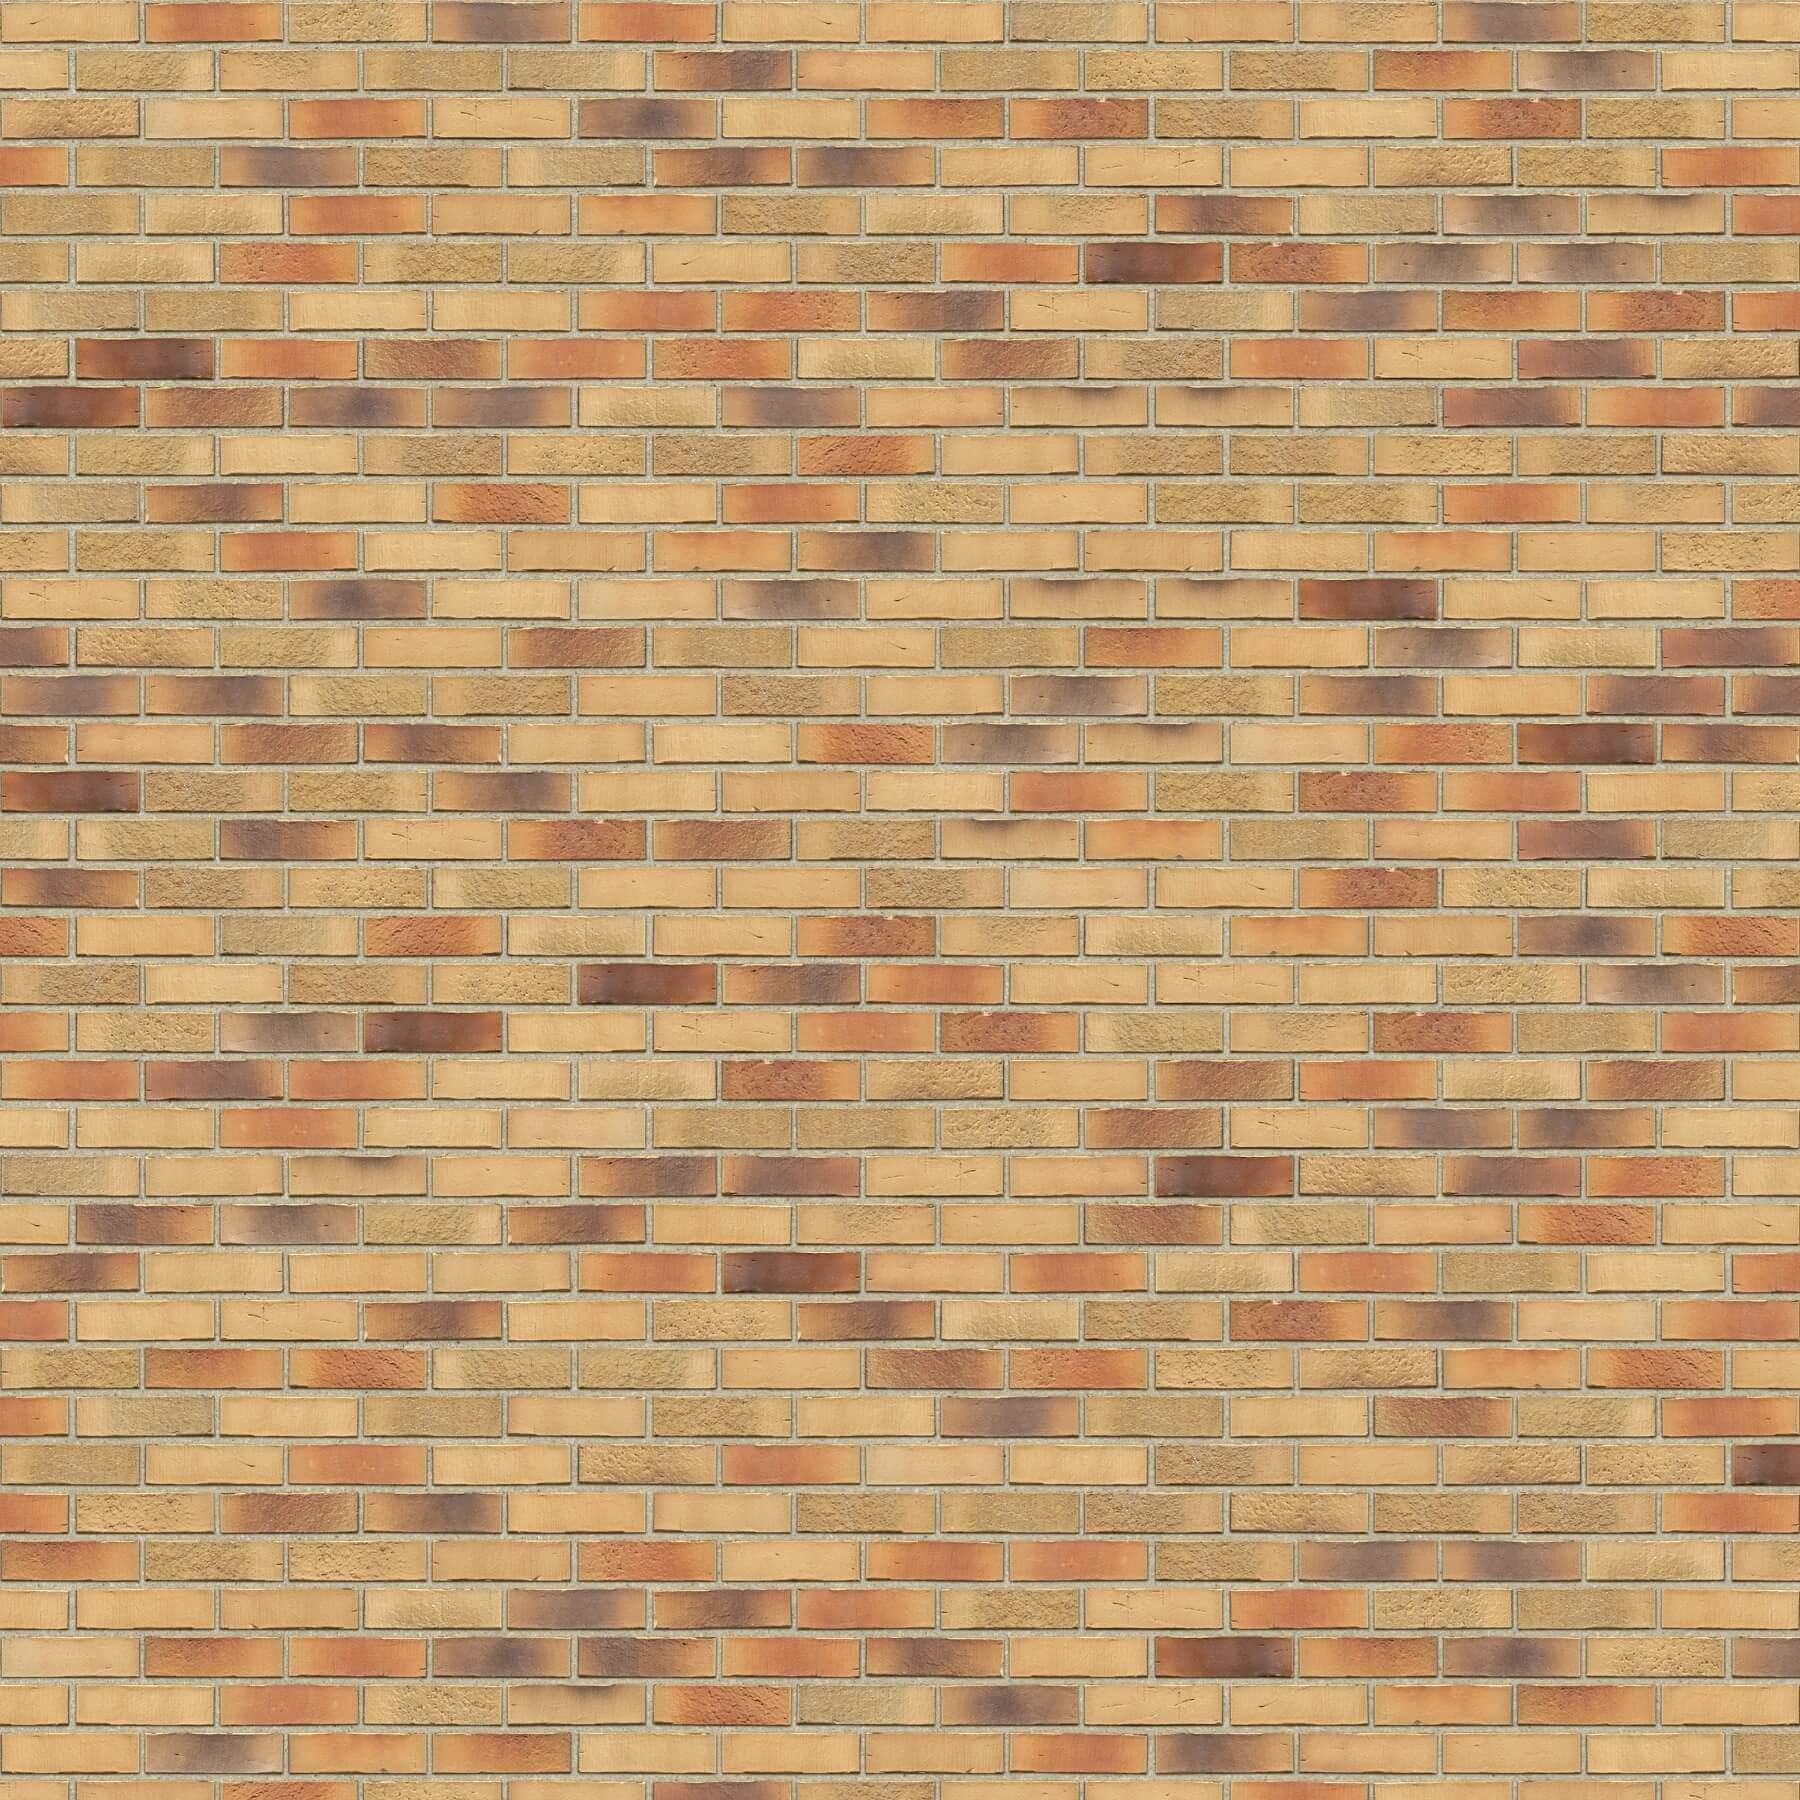 Puna-cigla-FeldHaus-Klinker-brick-house-beograd-nf-k-915-Bez Fuga